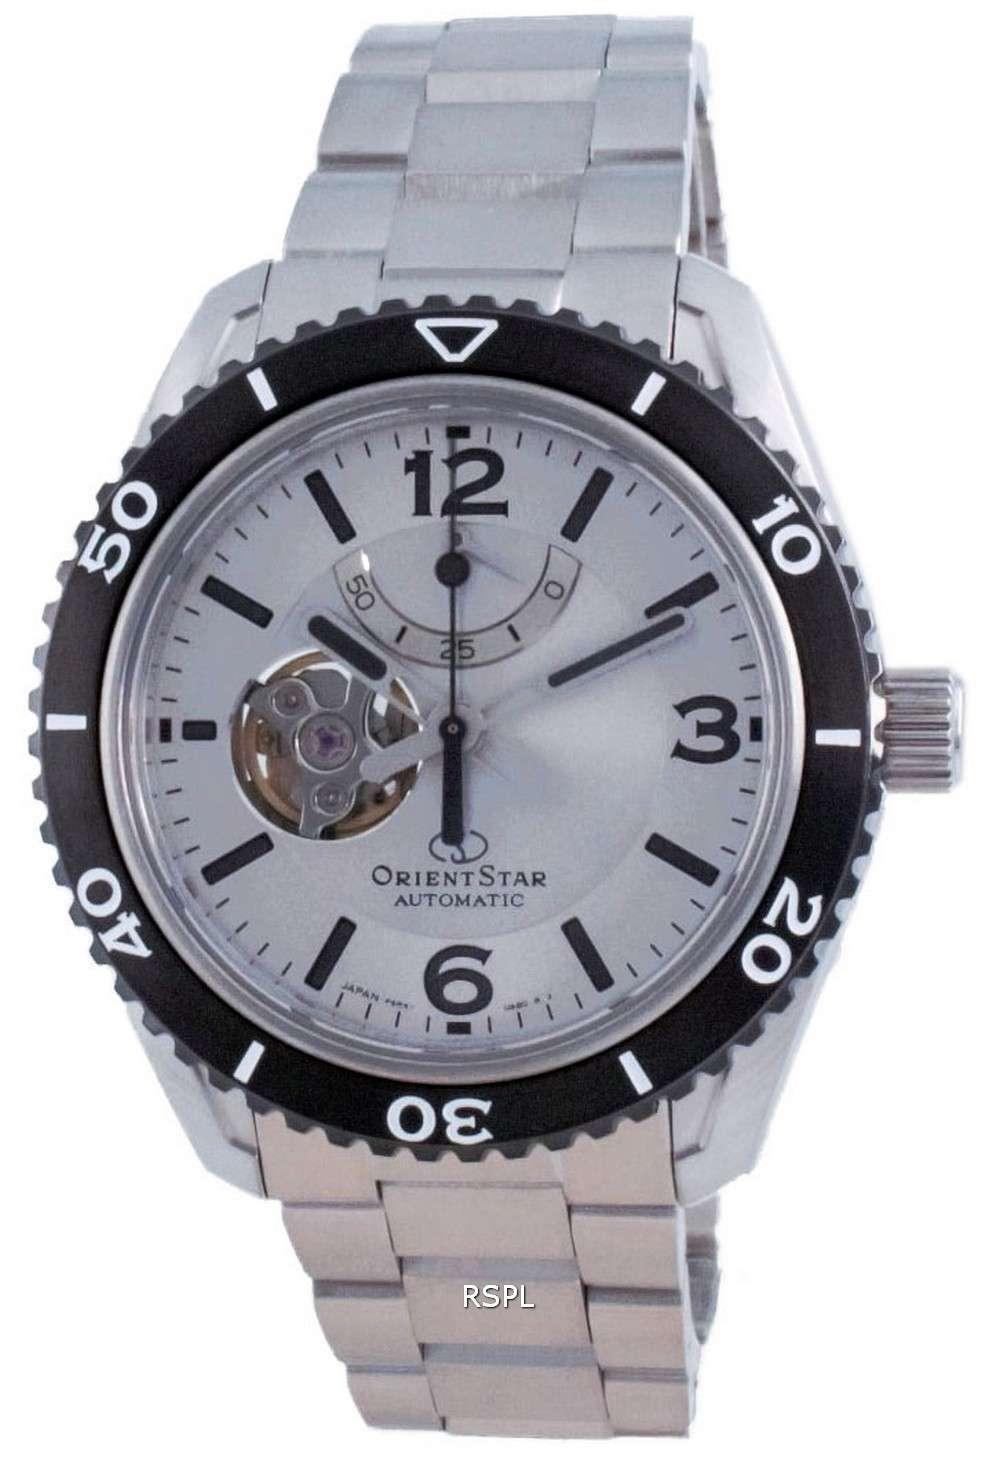 Reloj para hombre Orient Star Open Heart Automatic Diver&#39,s RE-AT0107S00B 200M